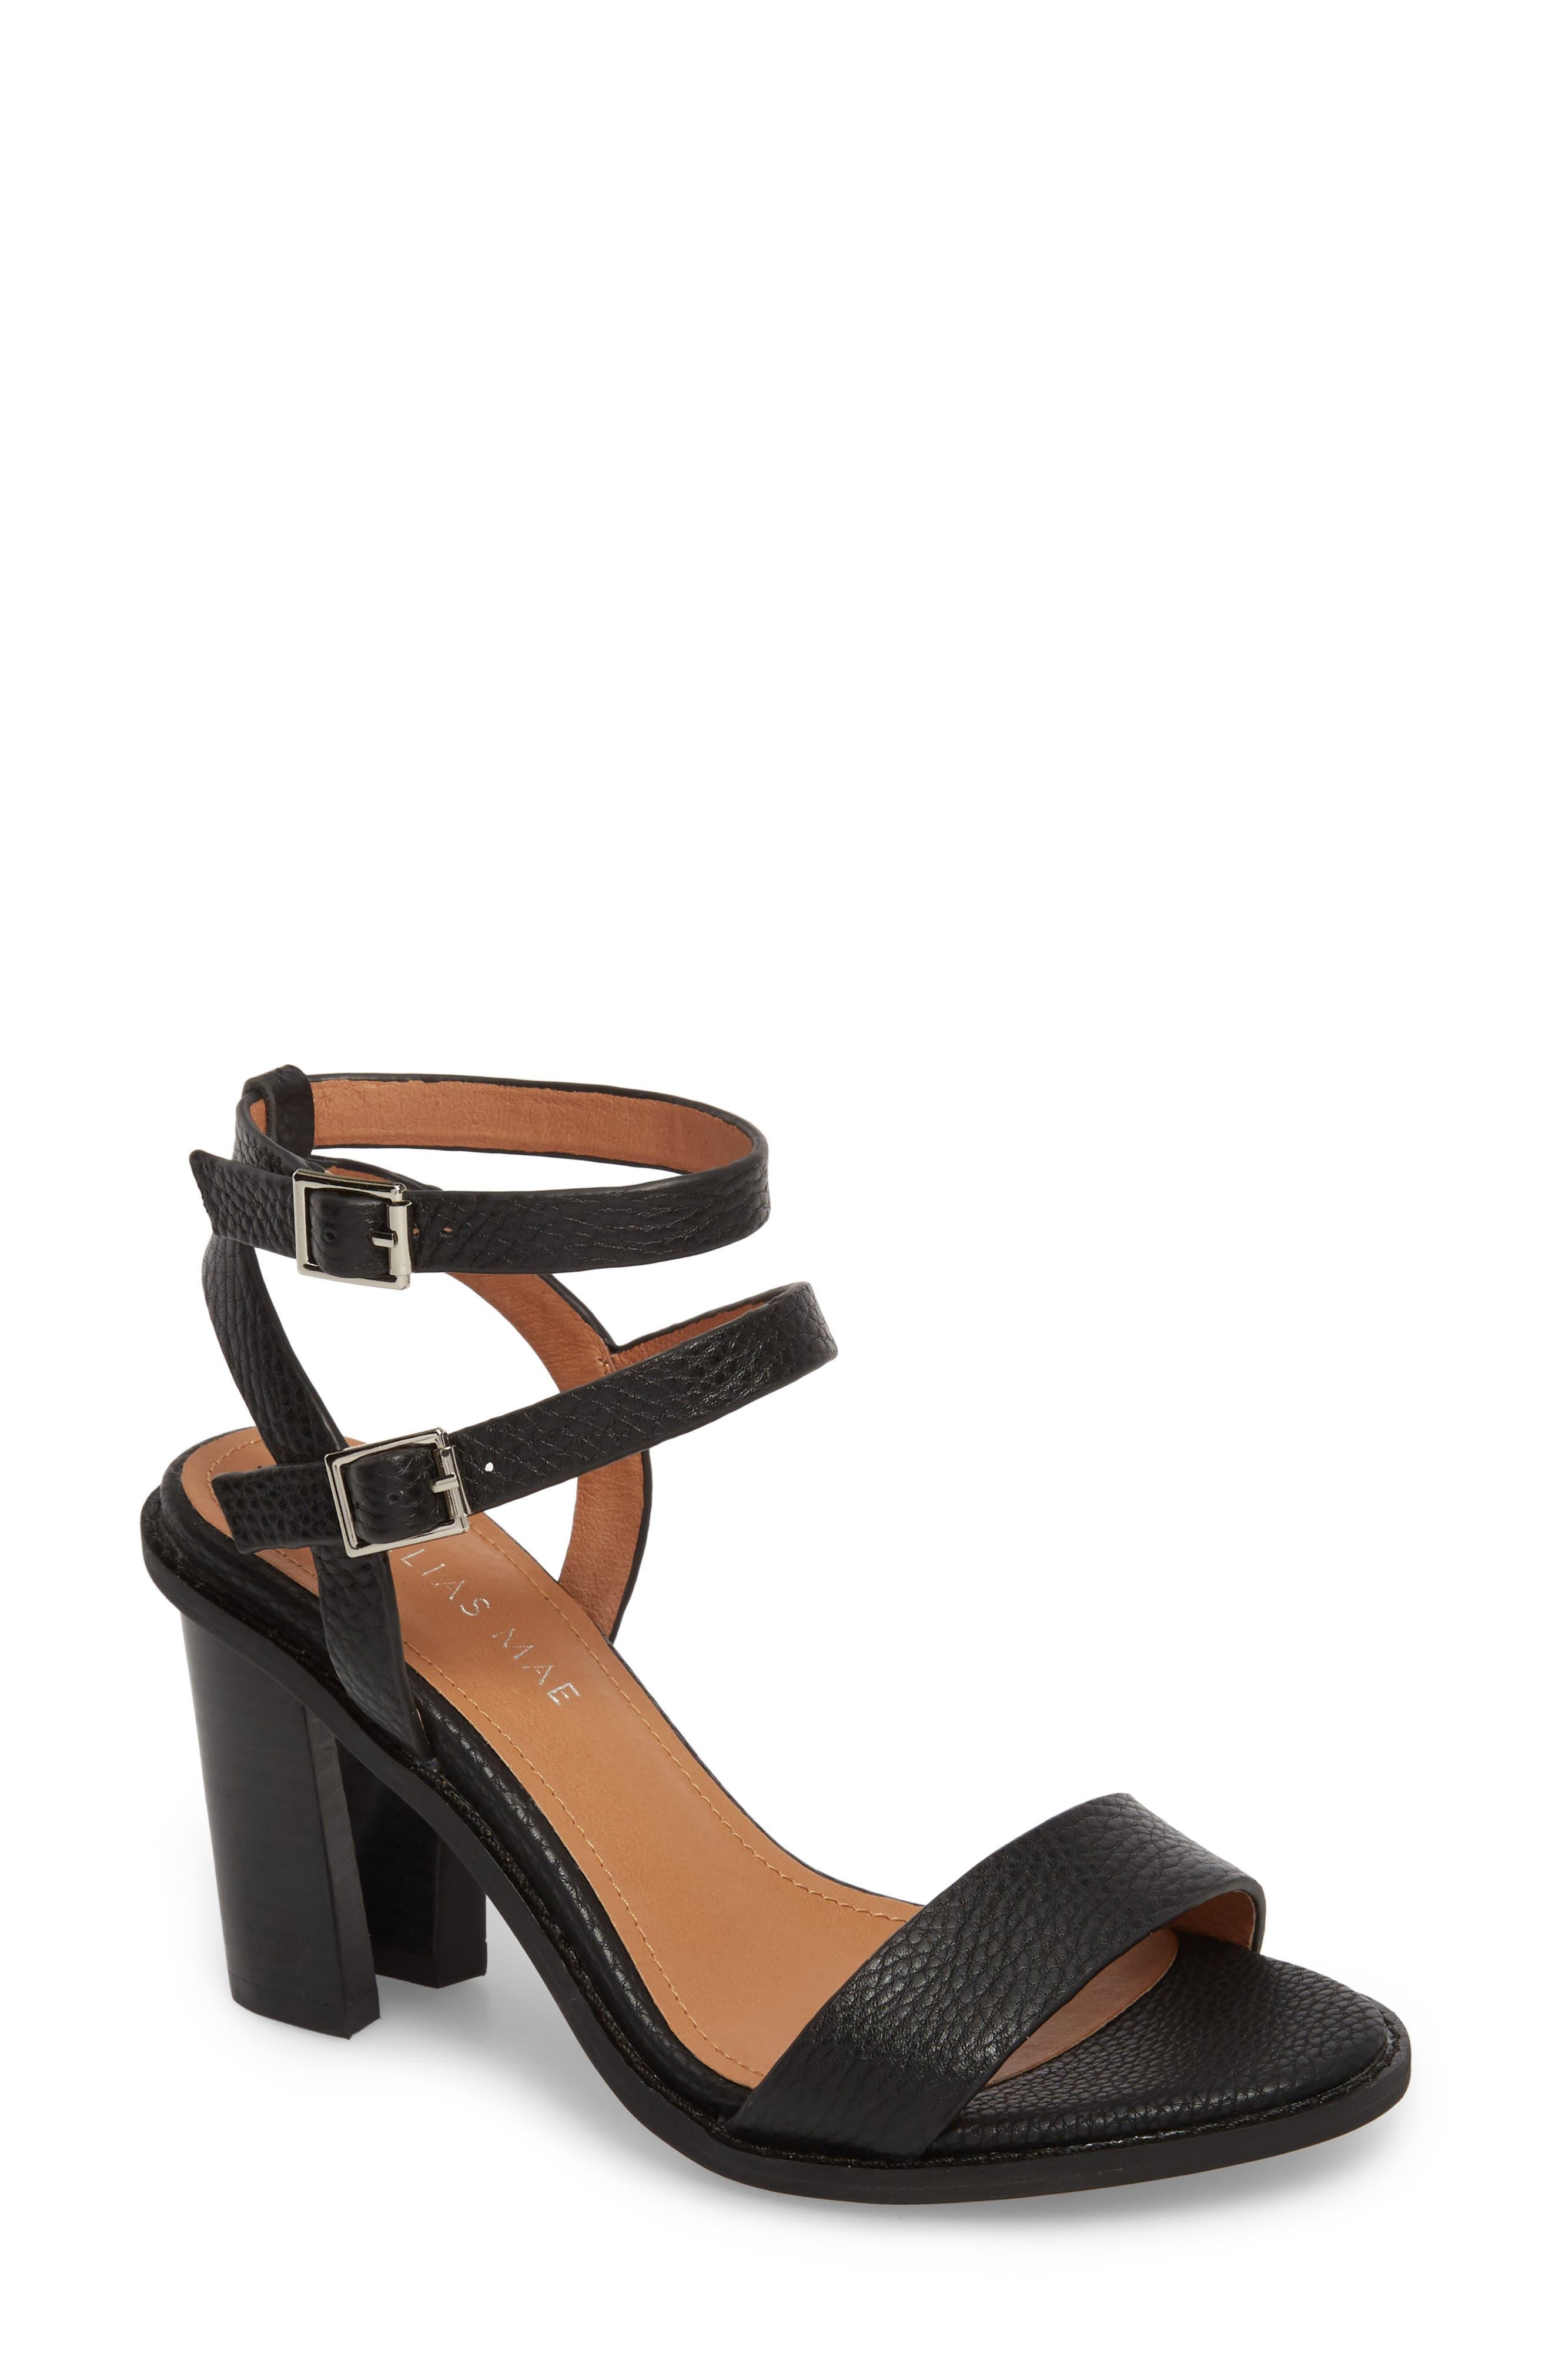 Elapse Sandal,                         Main,                         color, Black Leather